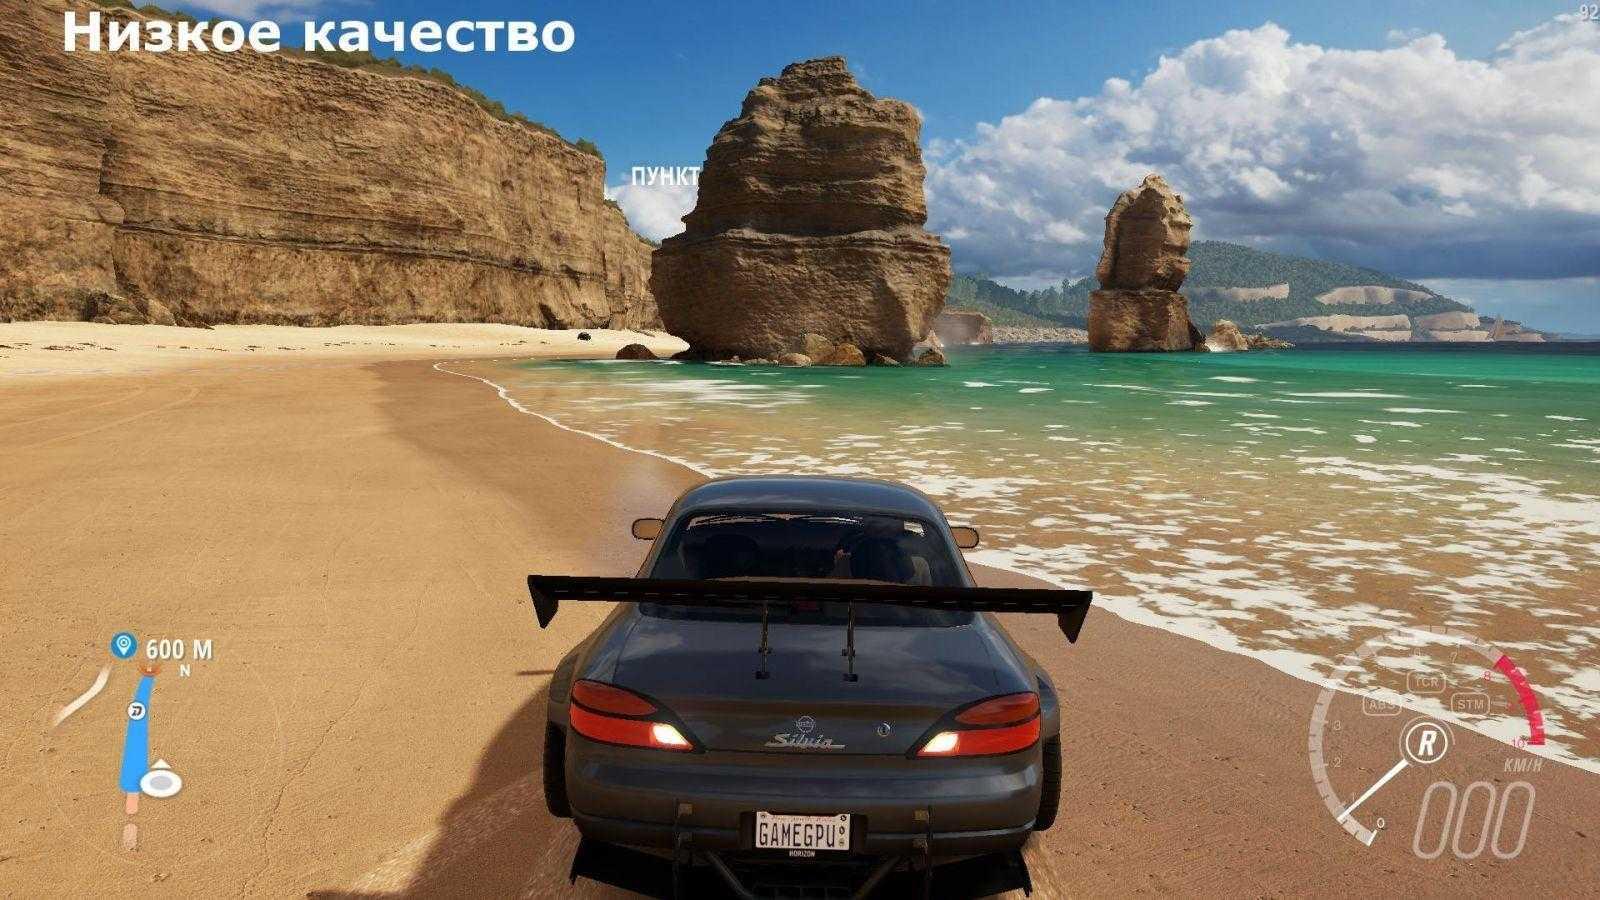 2 3 - Forza Horizon 3: тестирование производительности